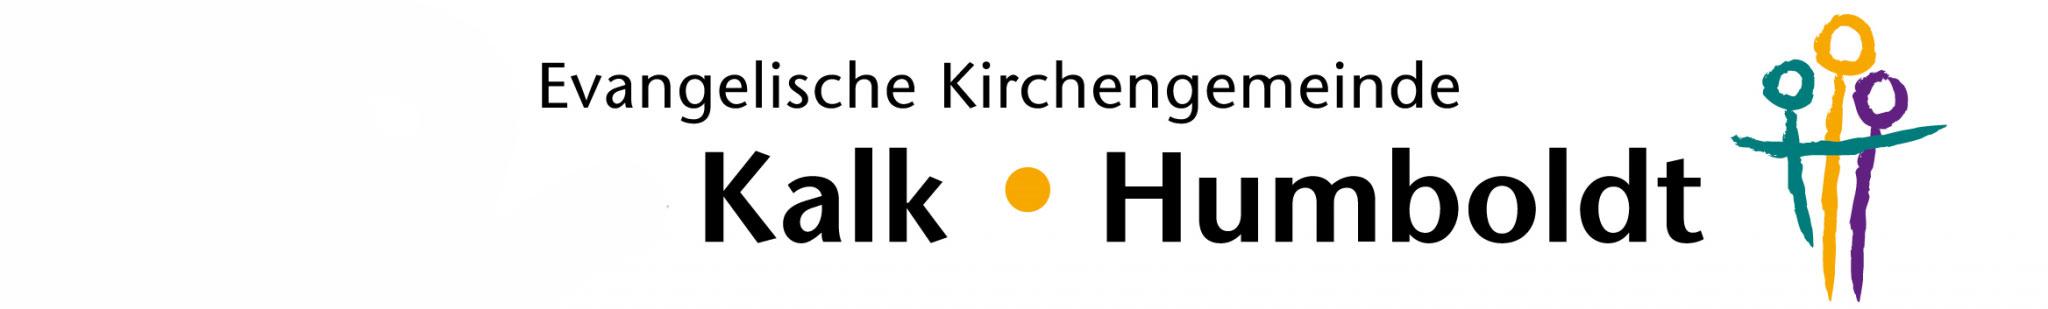 Evangelische Kirchengemeinde Kalk-Humboldt